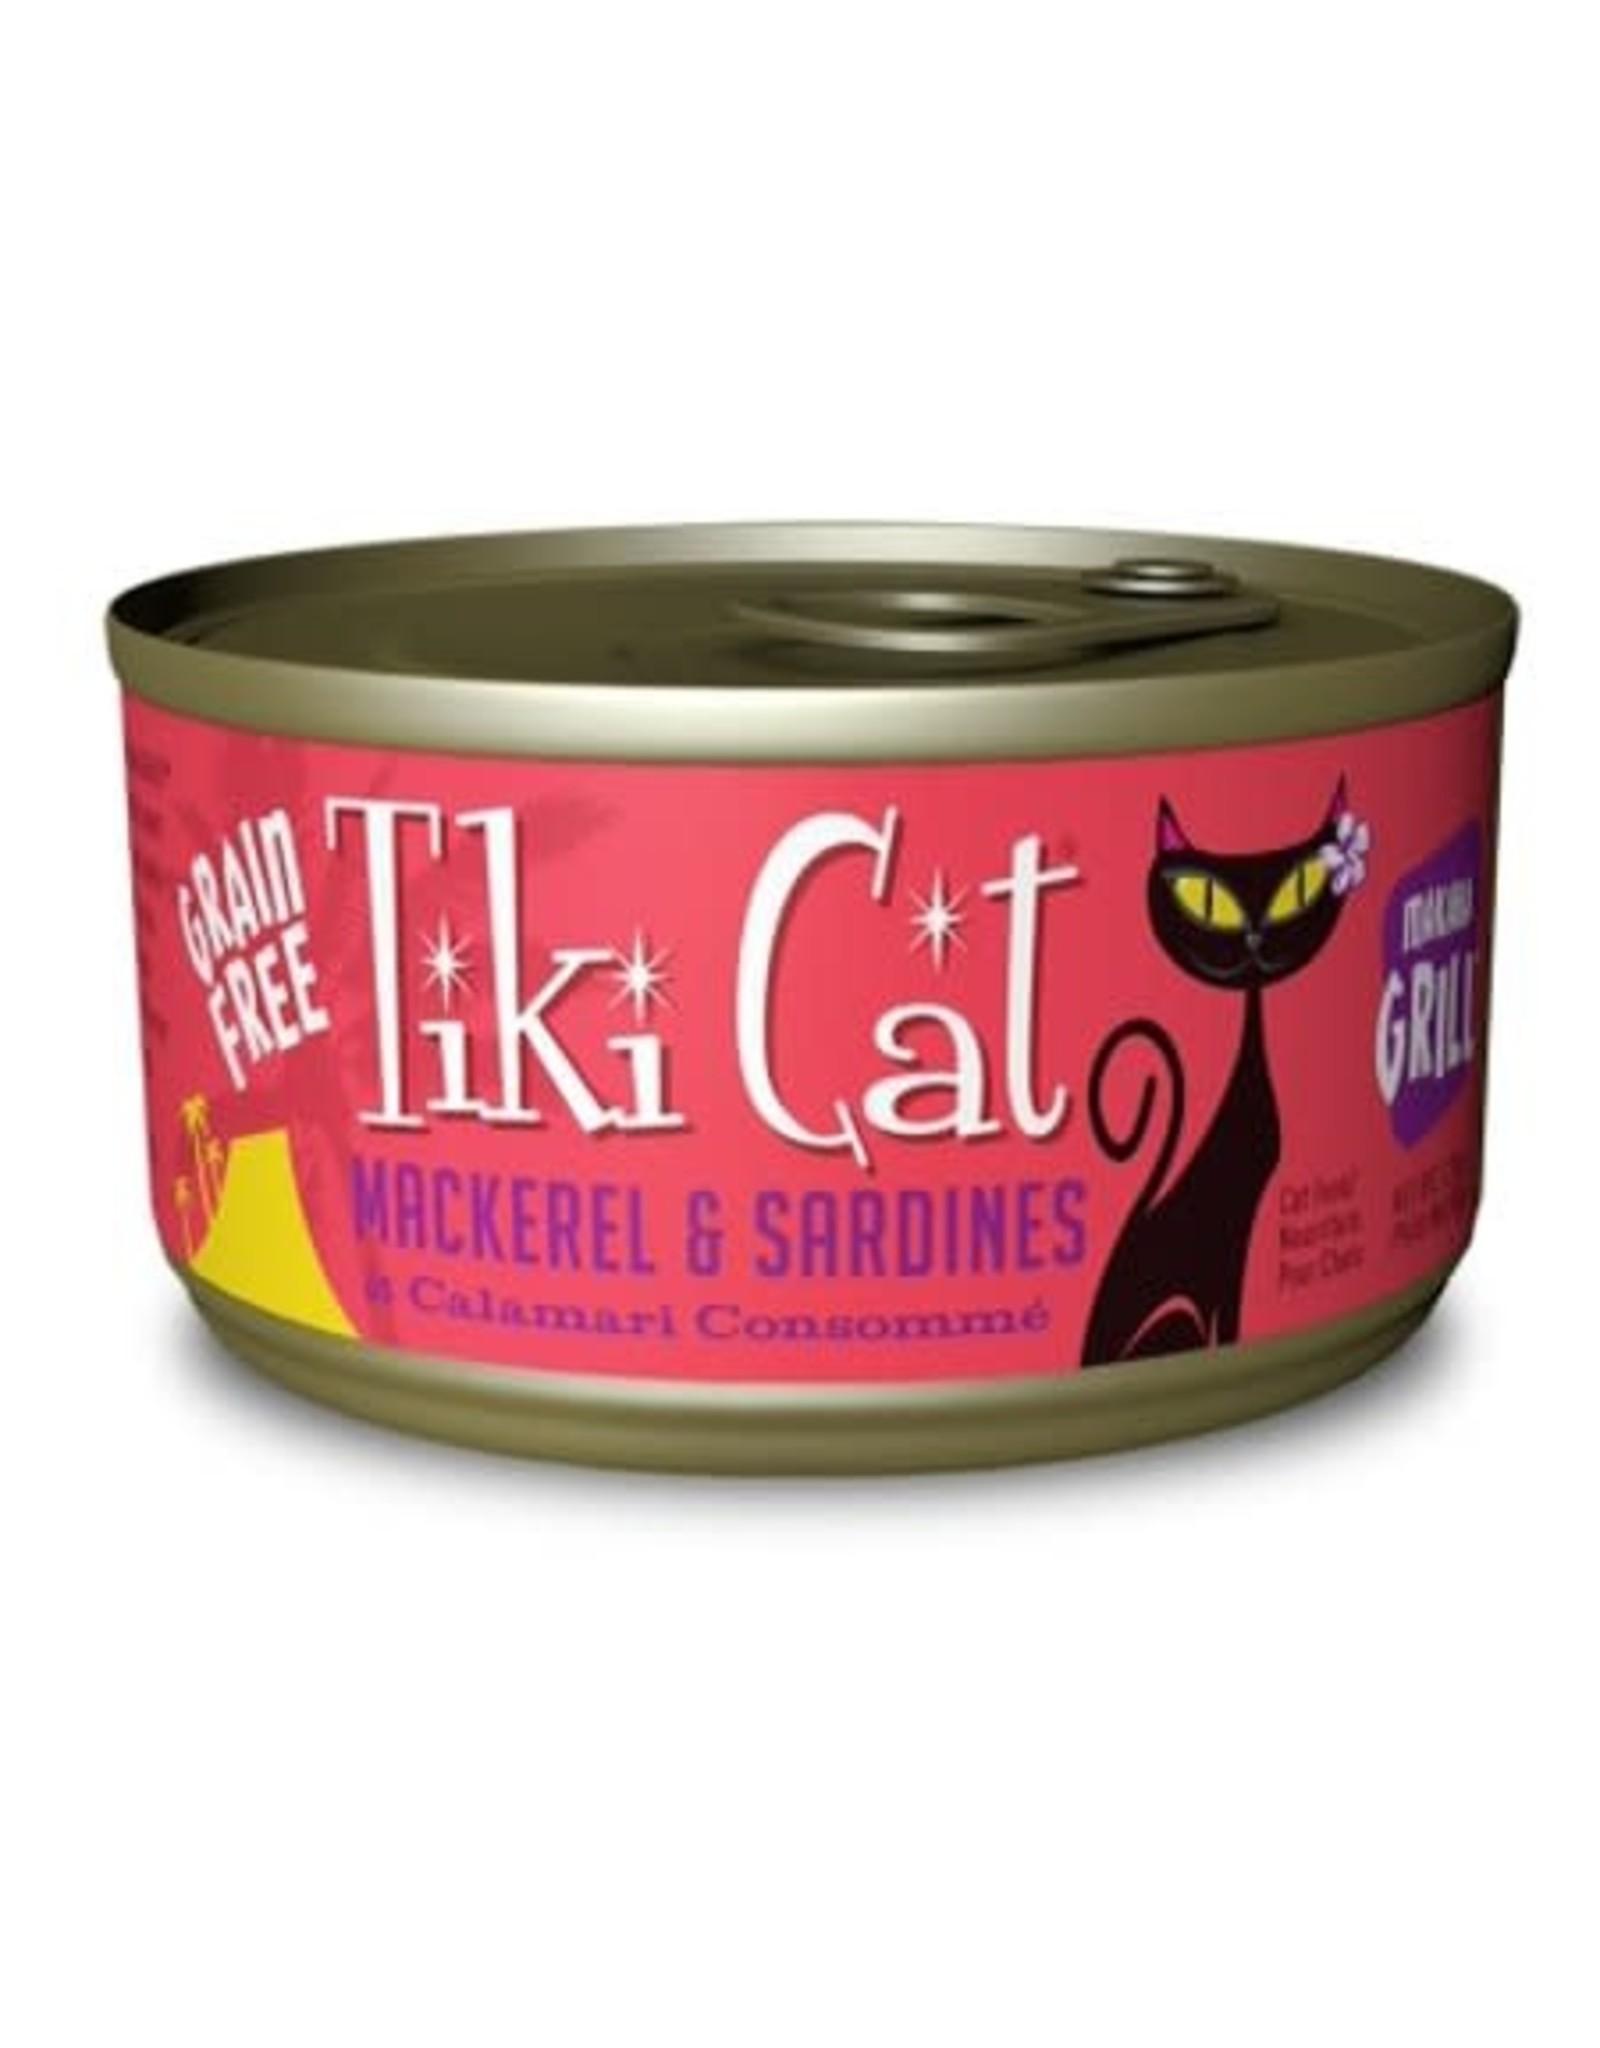 Tiki Cat Tiki Cat Grill Mackerel & Sar 2.8 oz